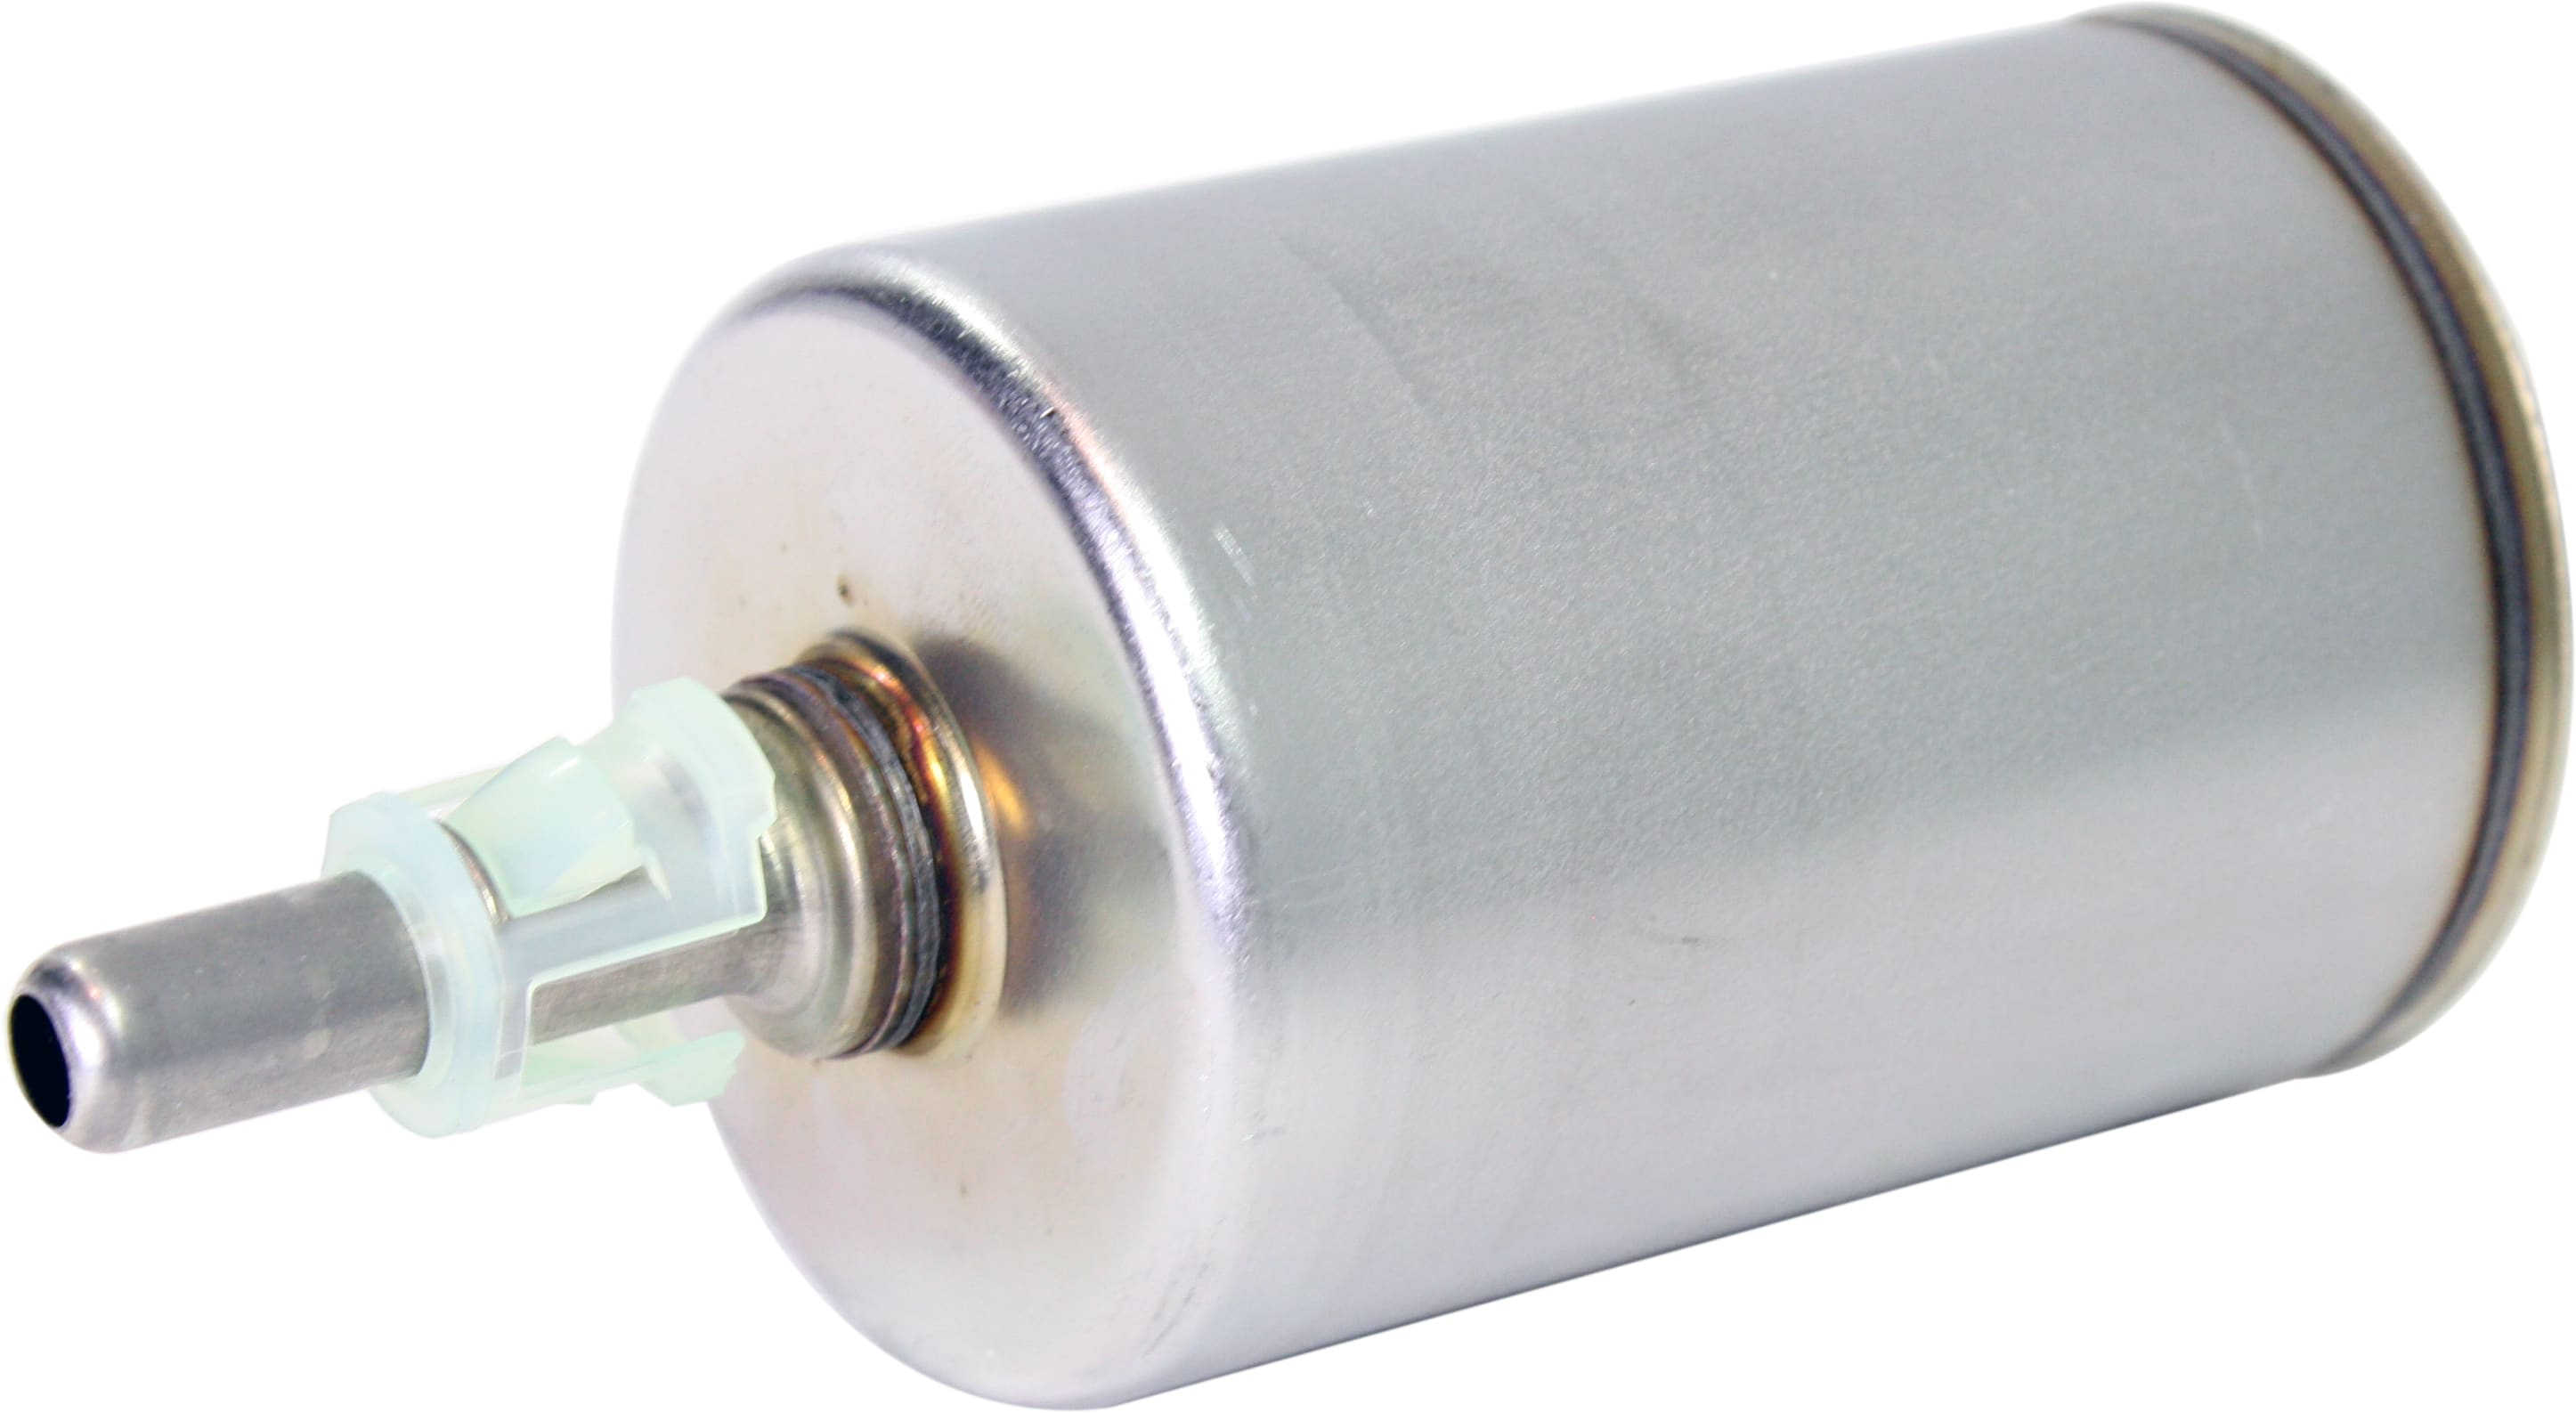 acgf578_2  Impala Fuel Filter Location on impala speed sensor location, impala cabin air filter location, impala thermostat location, impala flasher switch location,